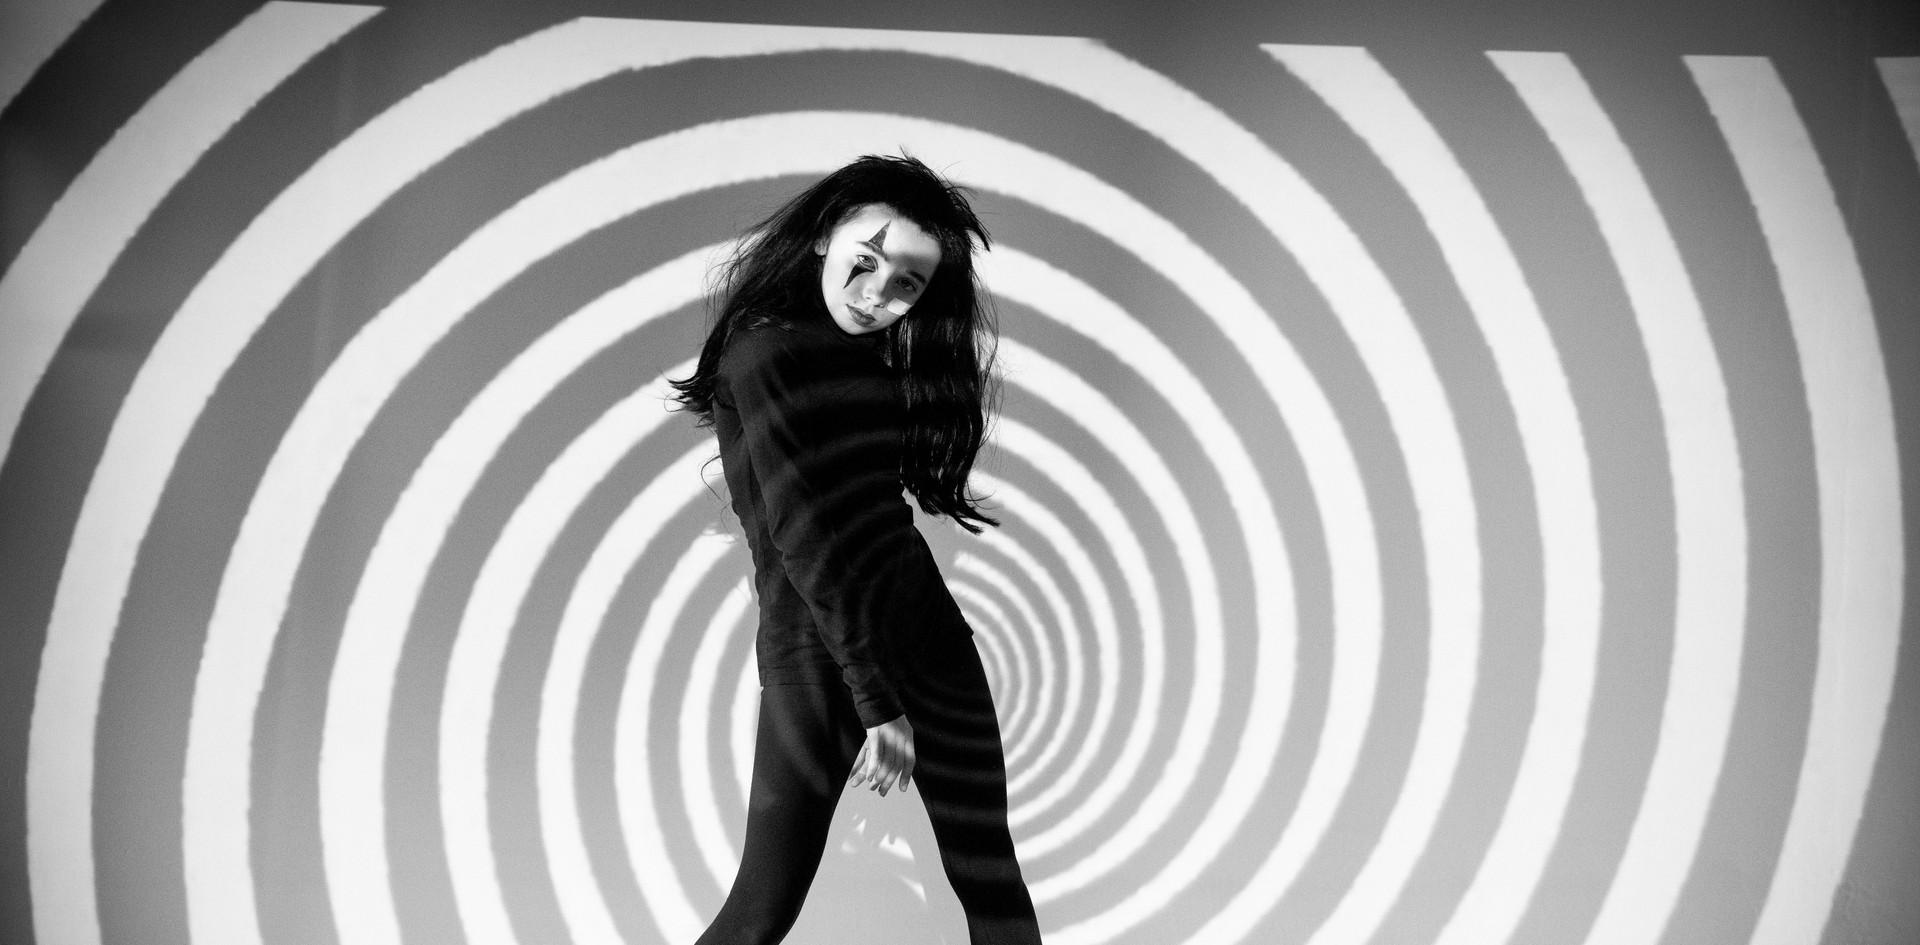 Lily Goehring Dancer Las Vegas Music